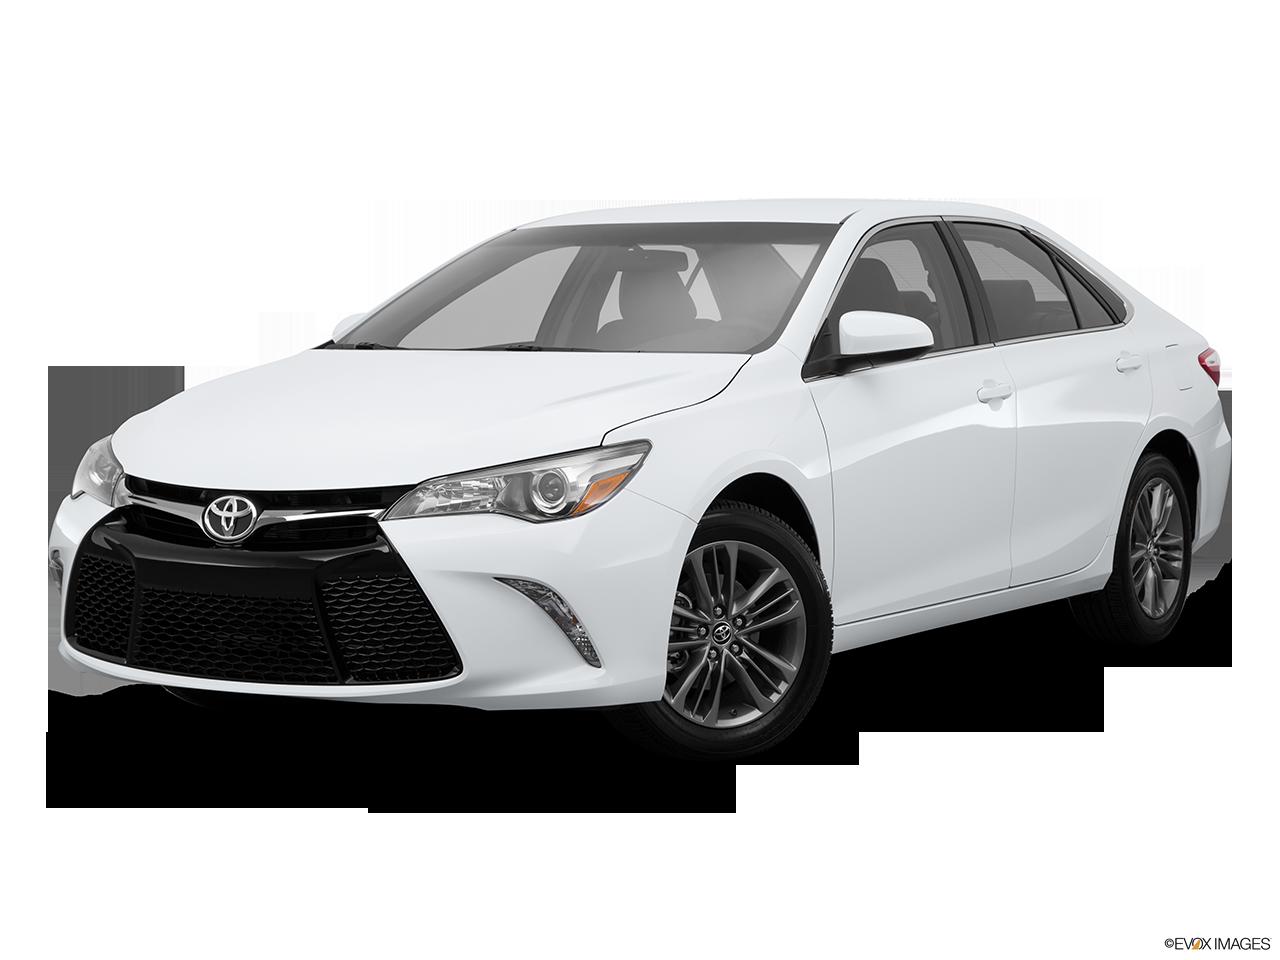 Toyota 2015 Camry 2 Widescreen Car Wallpaper